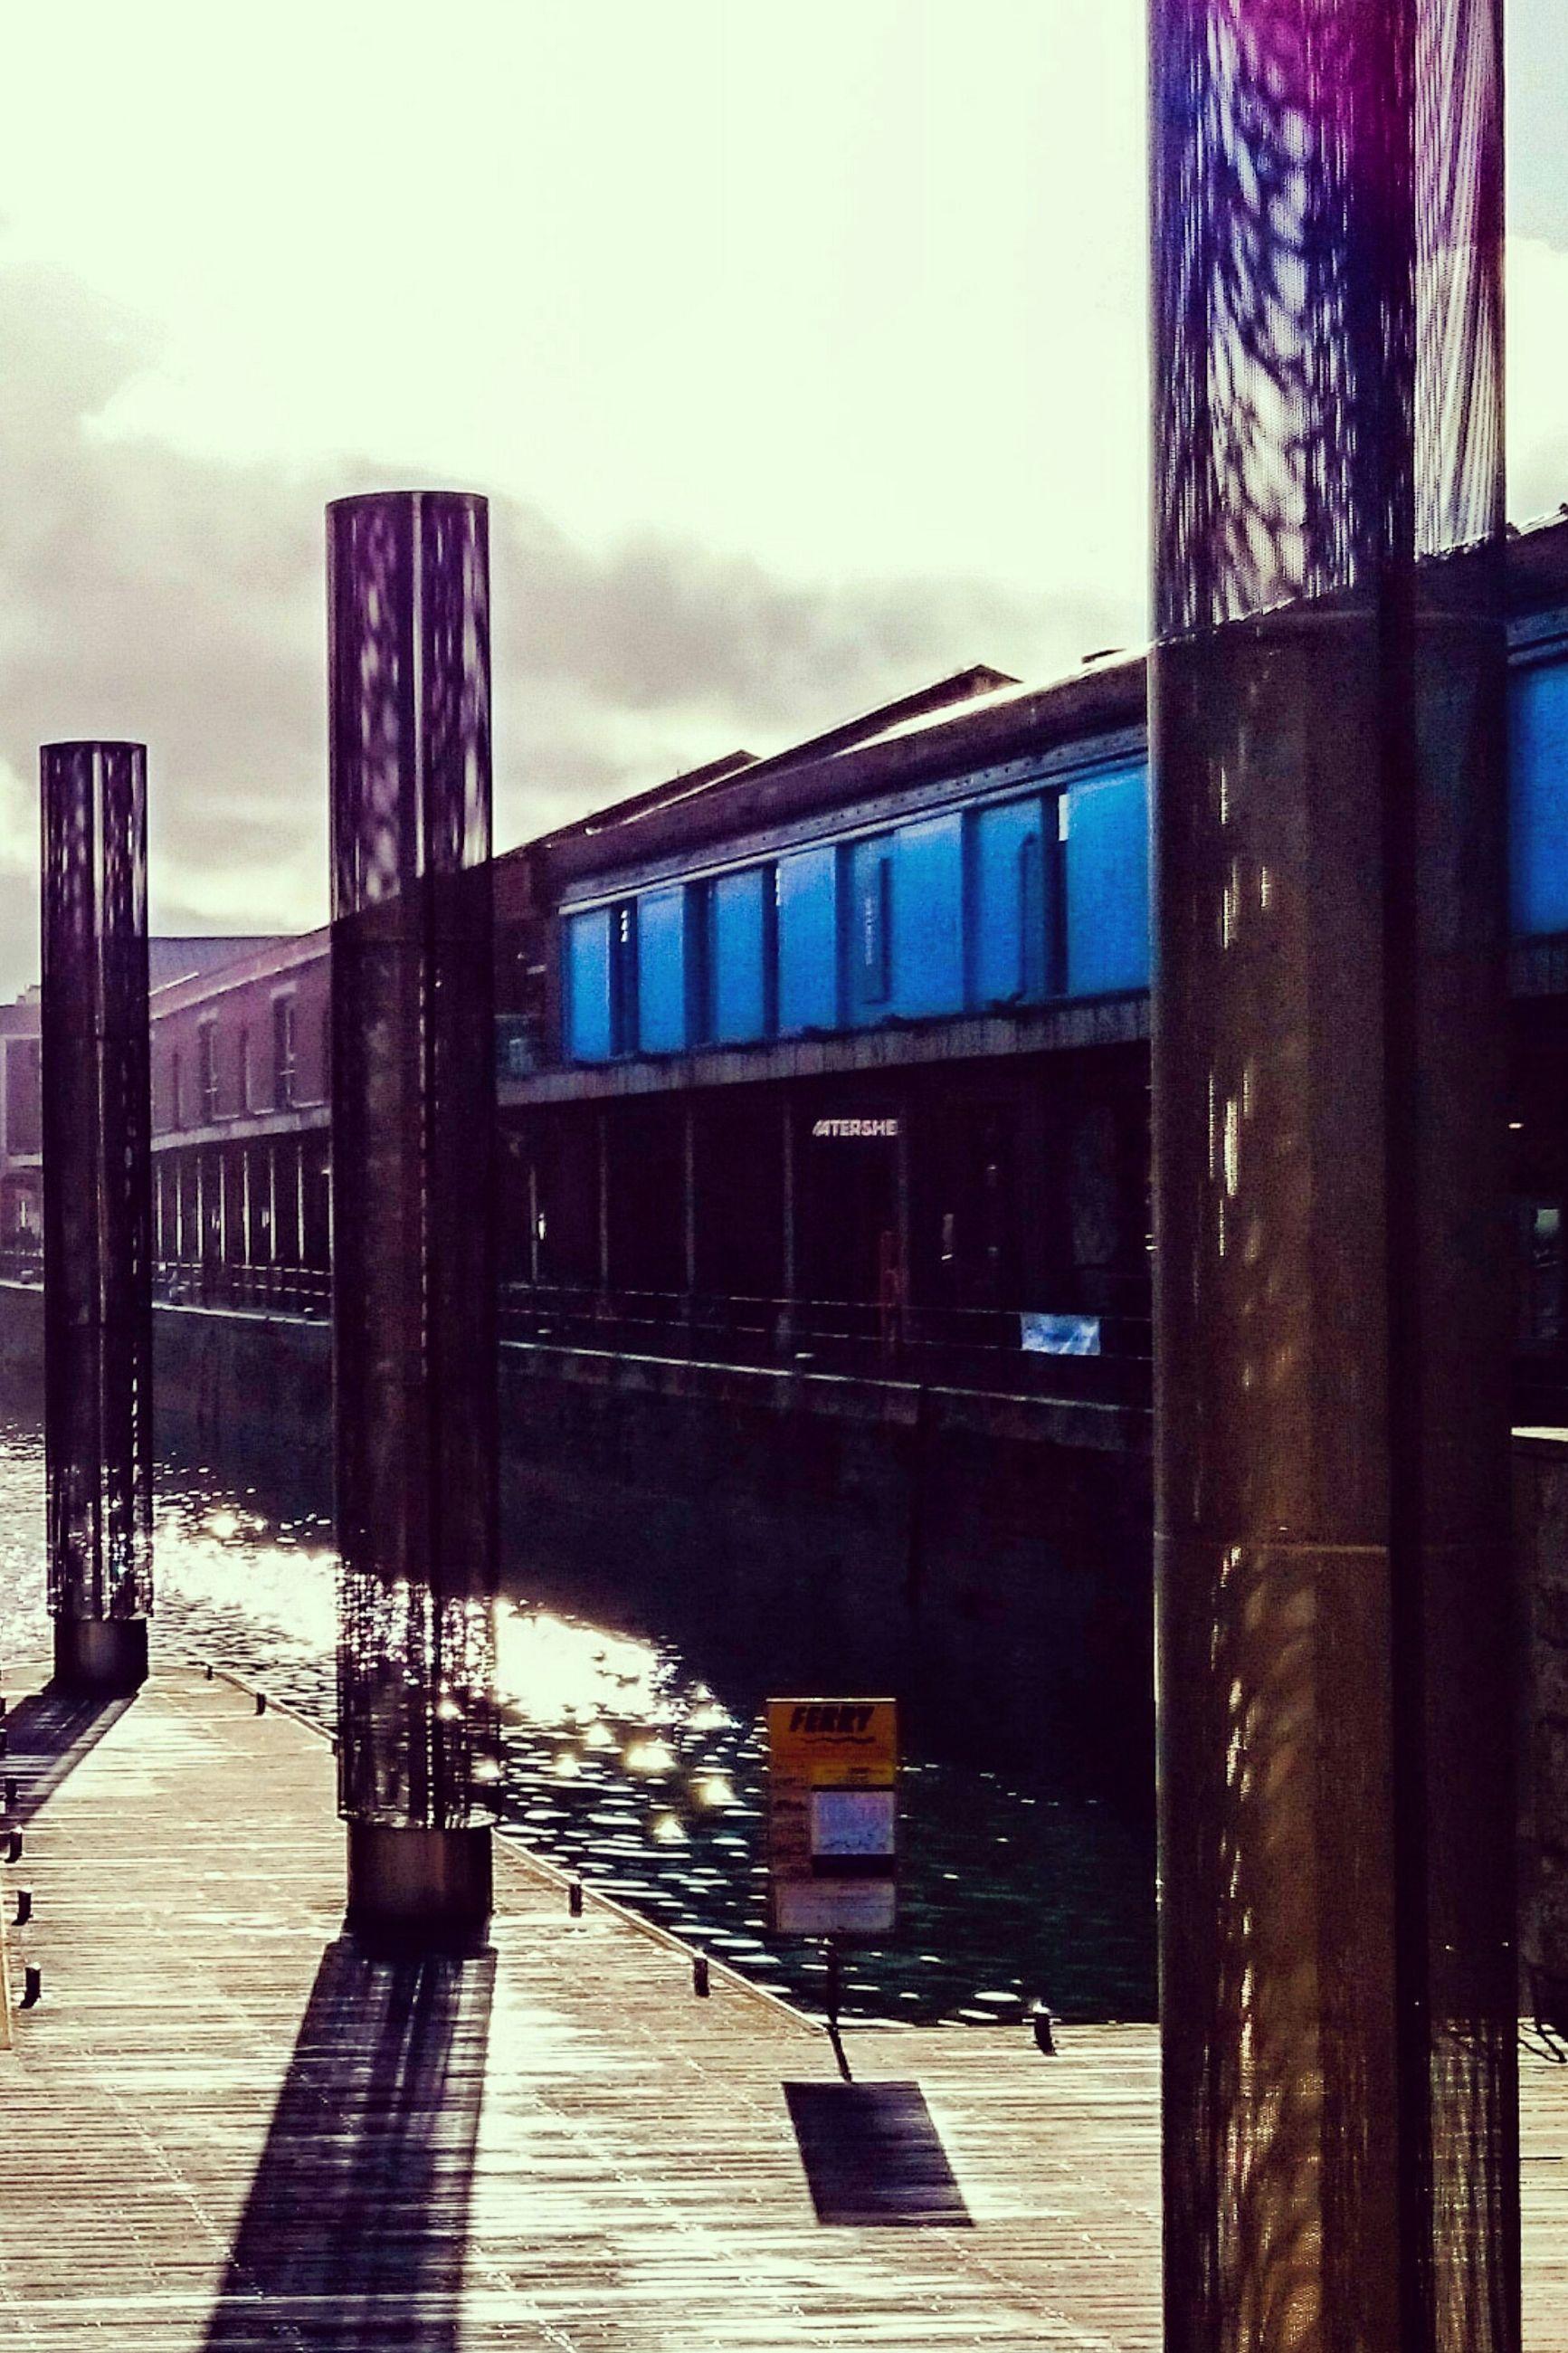 built structure, architecture, railing, building exterior, sky, wood - material, pier, architectural column, empty, column, outdoors, day, absence, boardwalk, bridge - man made structure, no people, footbridge, connection, city, bridge